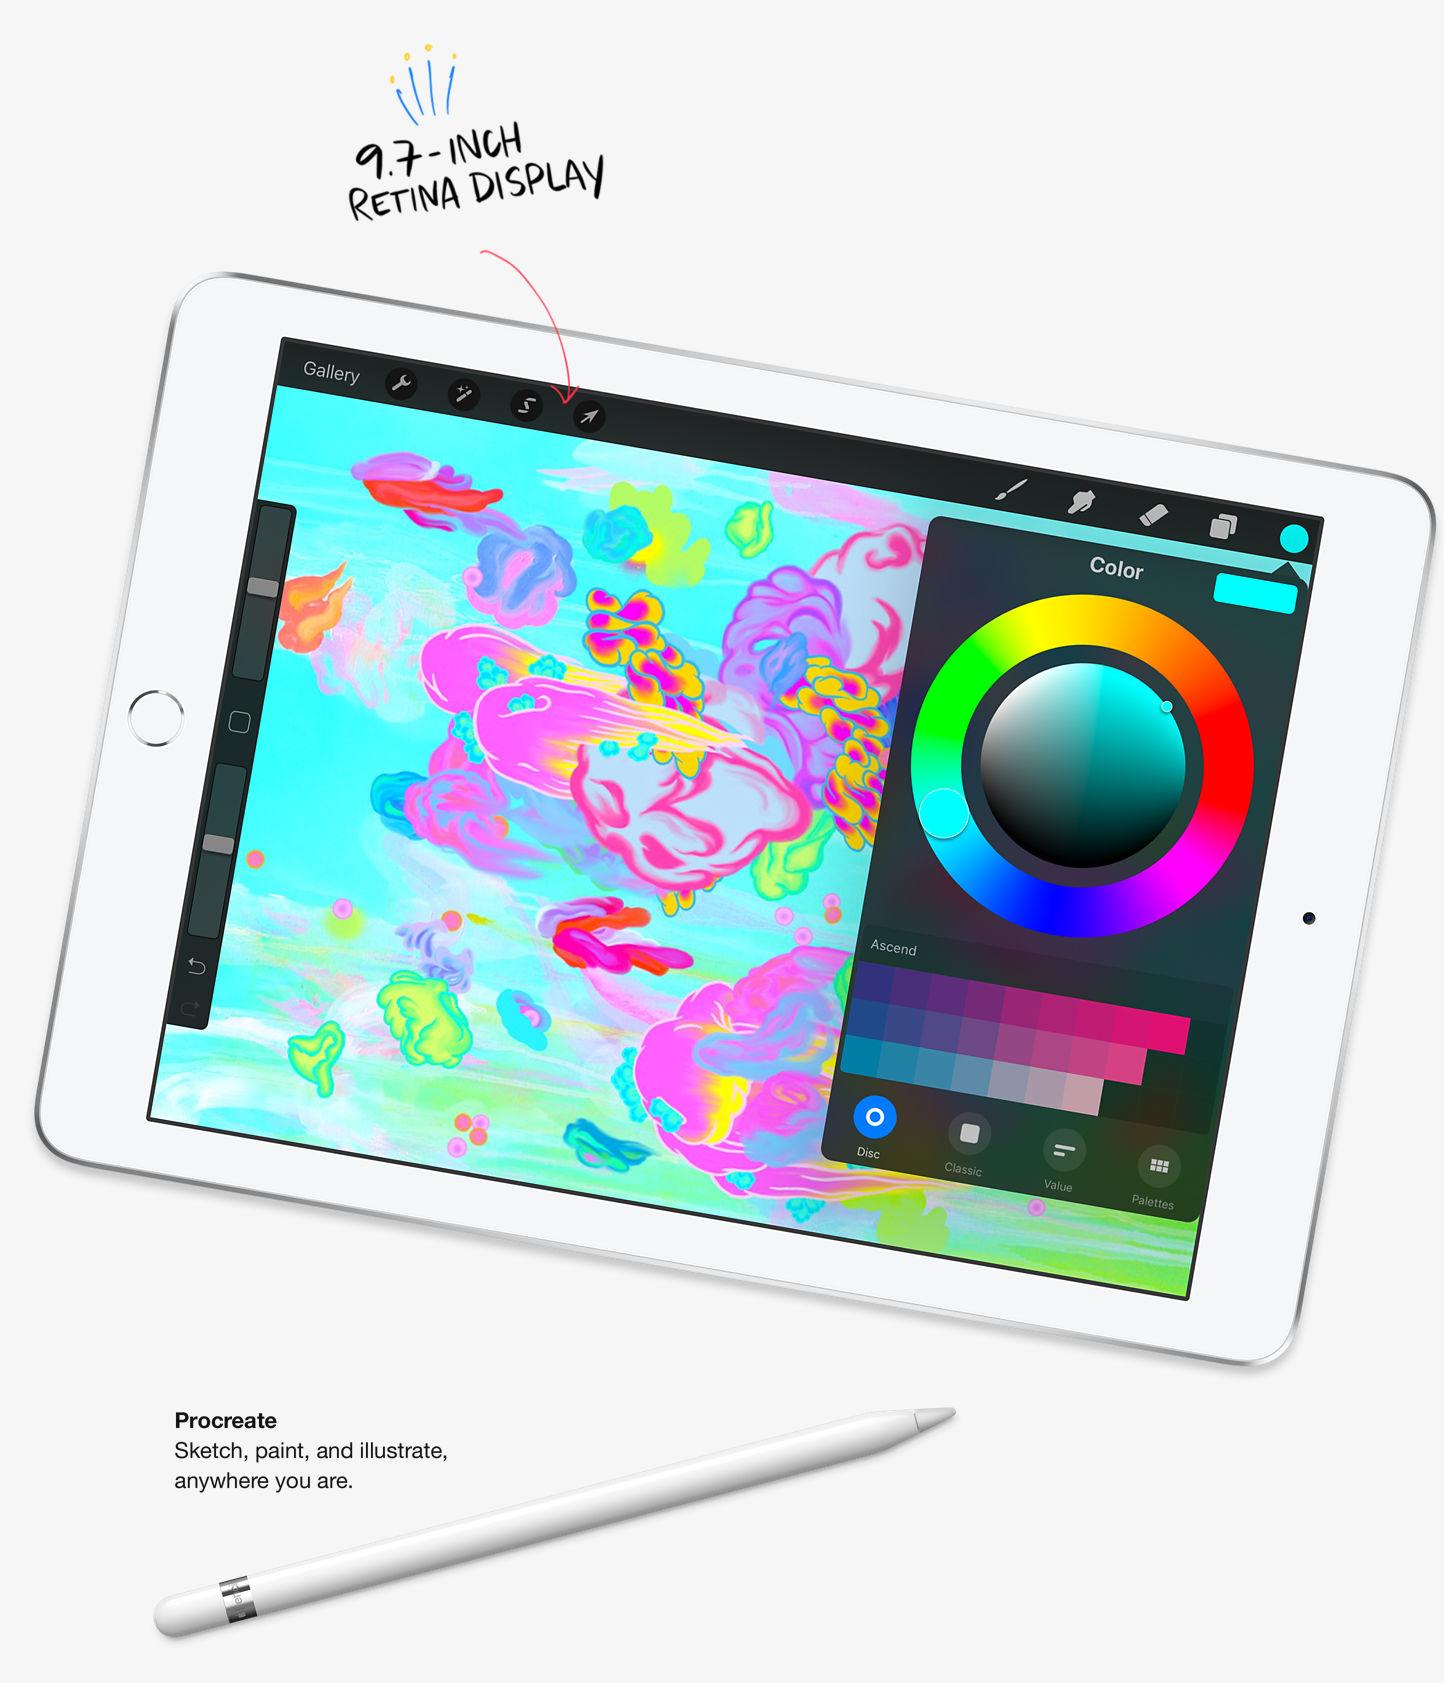 New Ipad 97 Prepaid Verizon Wireless Home Network Diagram Retina Display As Beautiful It Is Functional